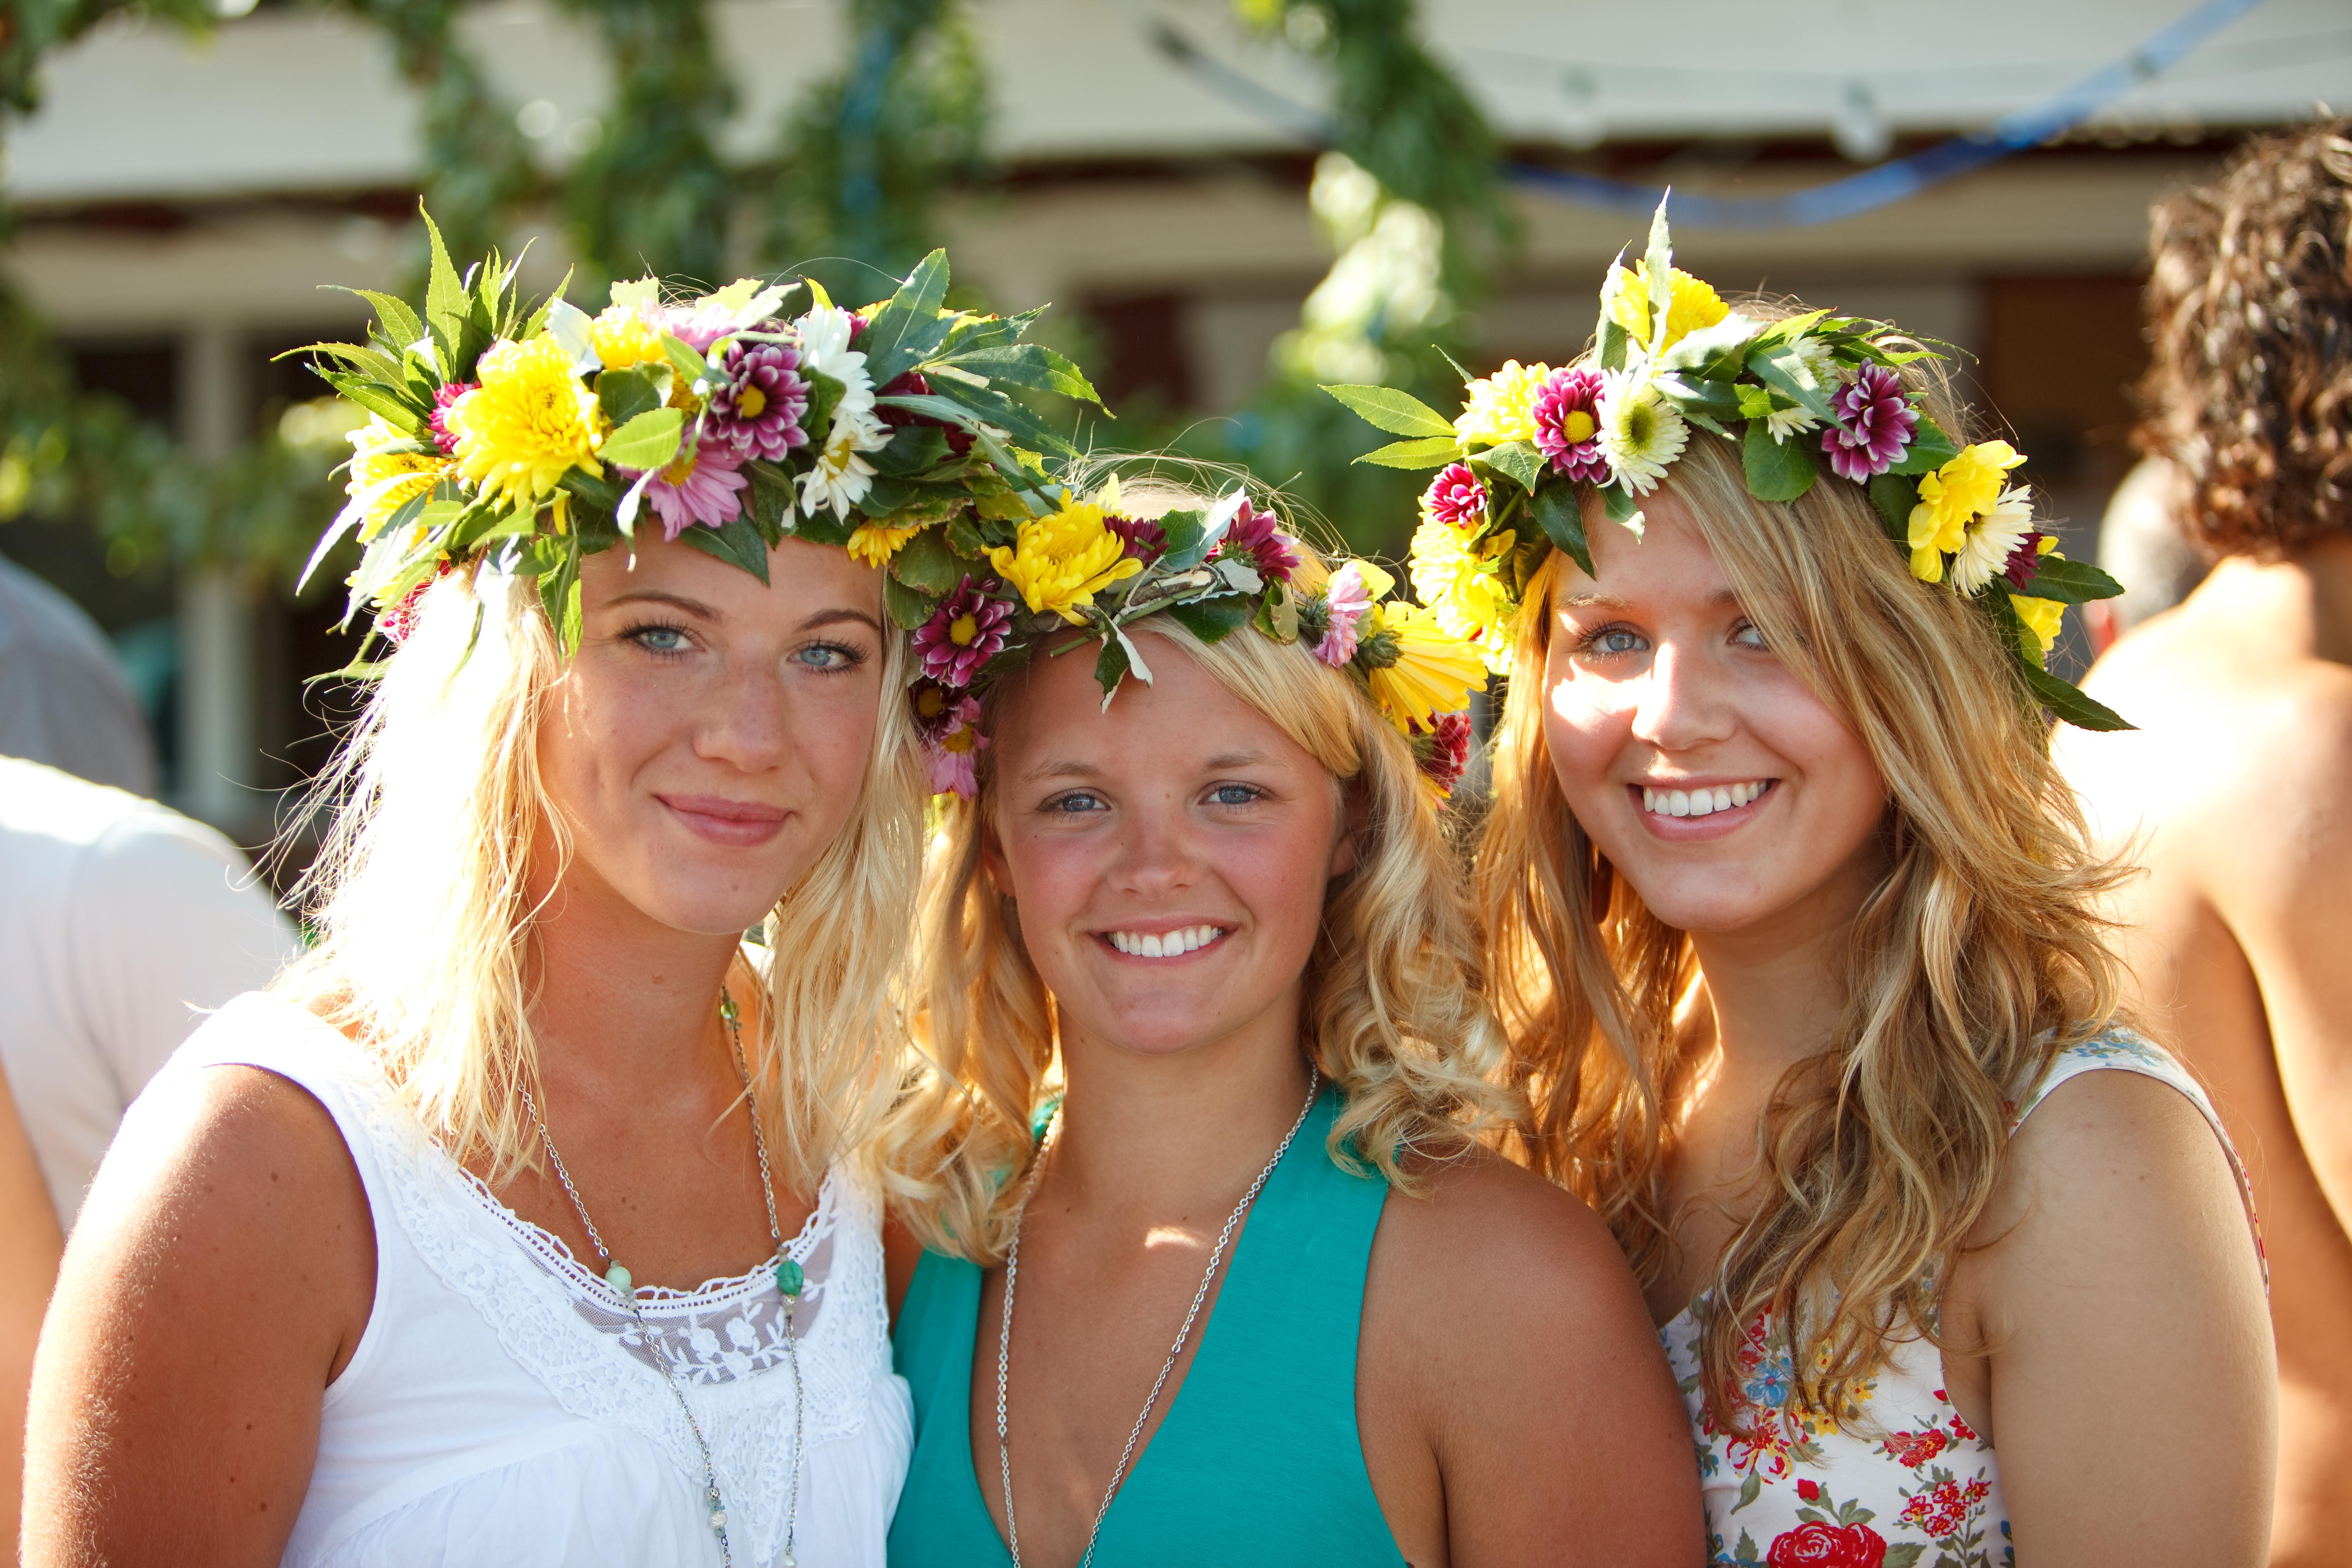 Sweden women giving head